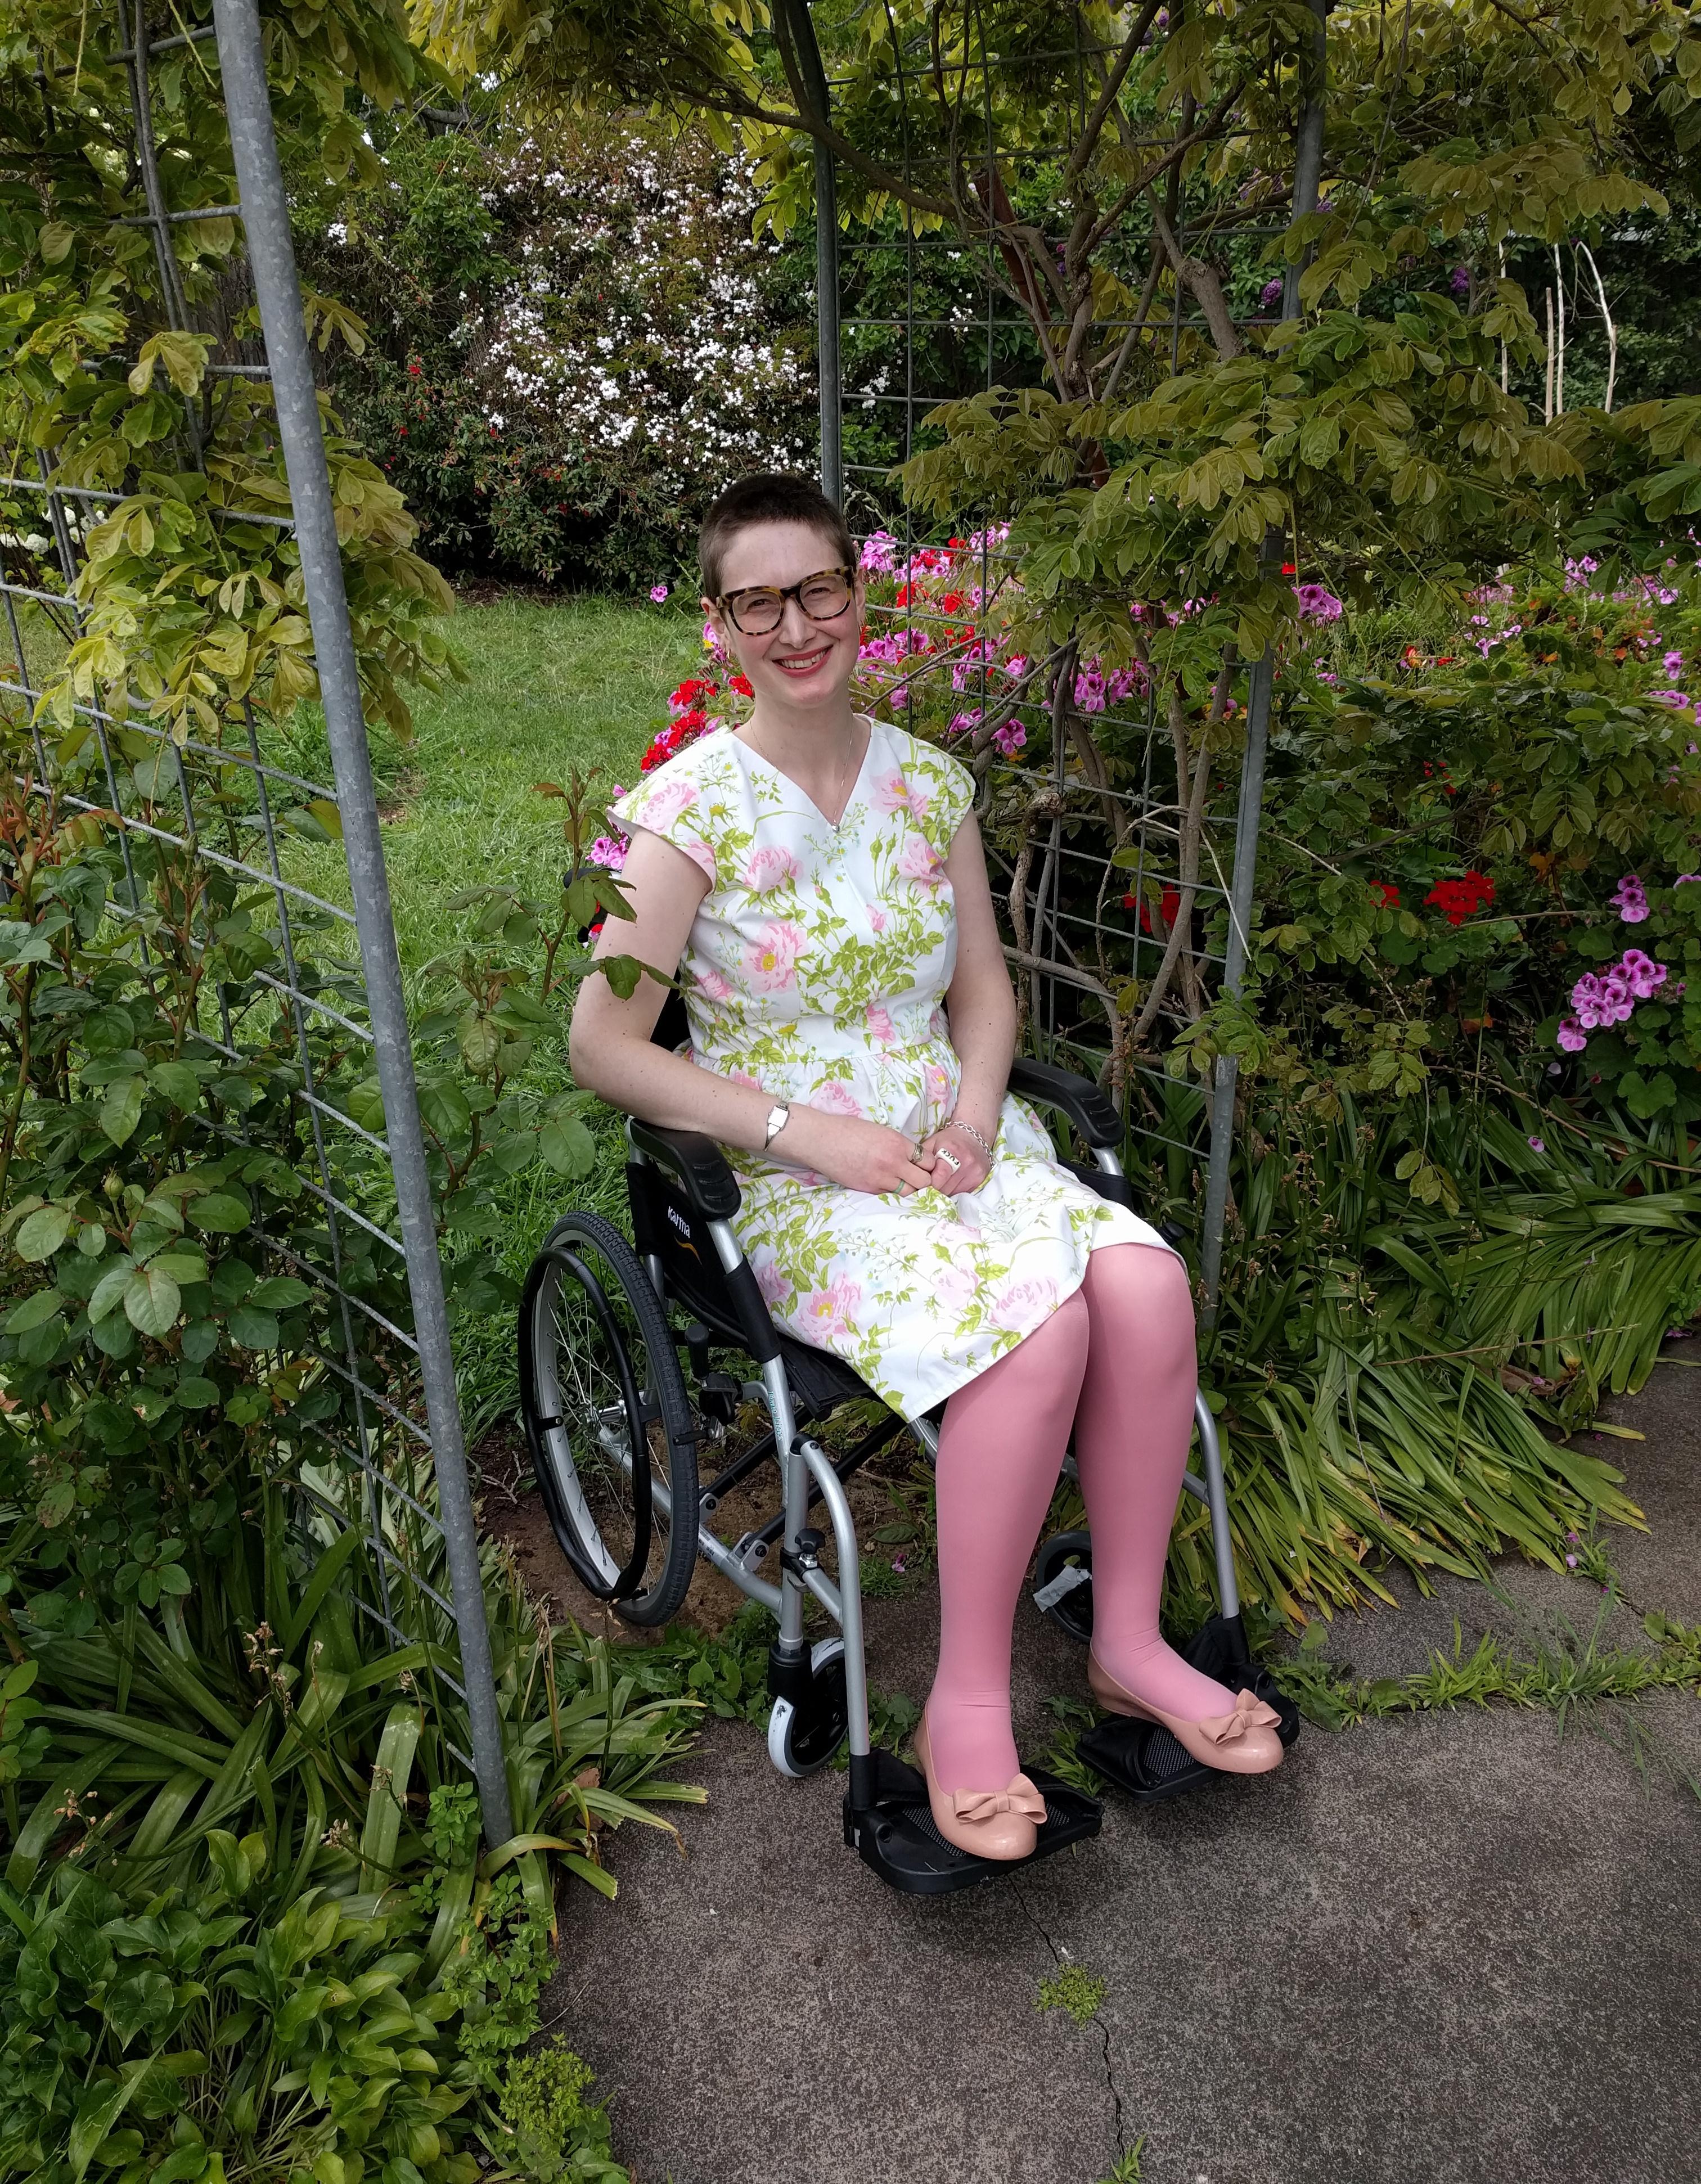 woman in wheelchair in a garden